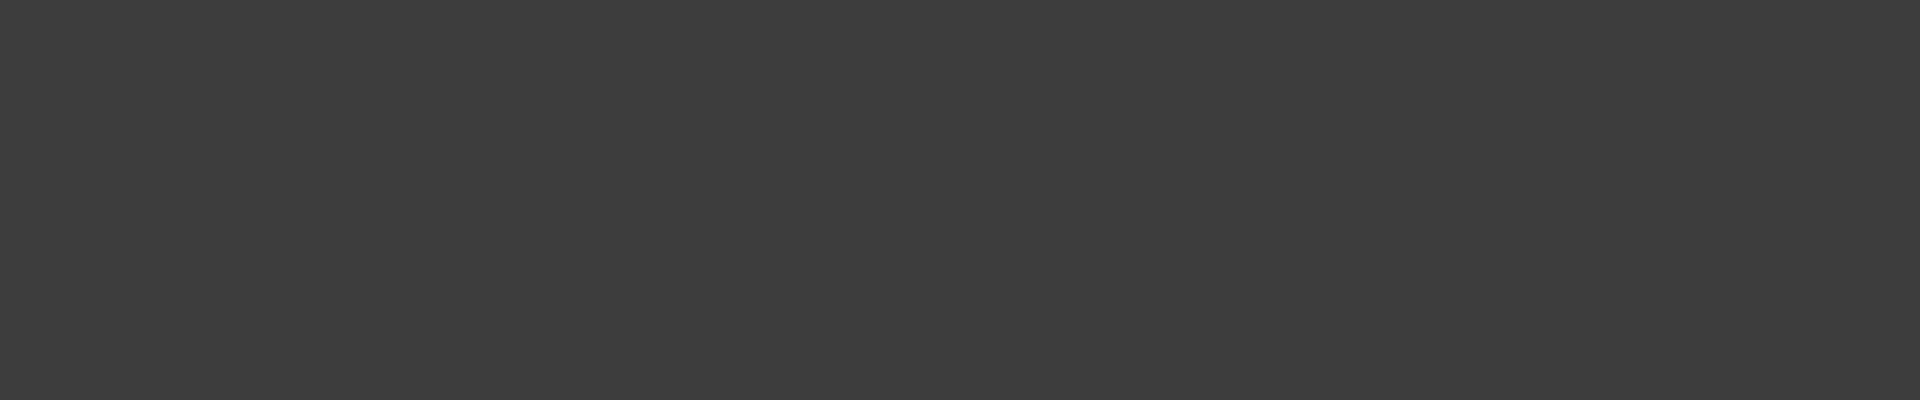 portfolio-slider